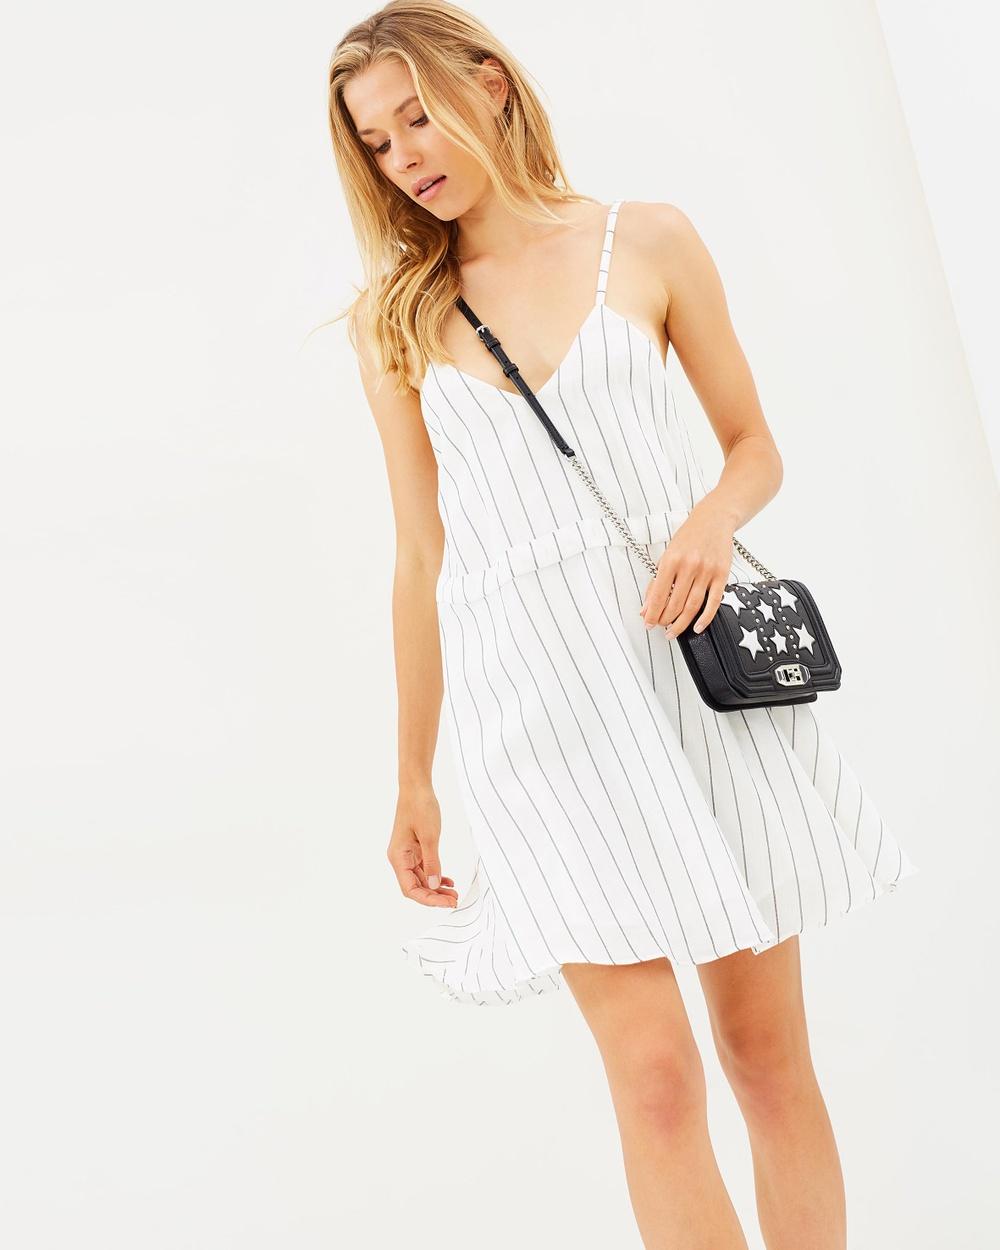 PFEIFFER Vance Mini Dress Dresses Salt Vance Mini Dress